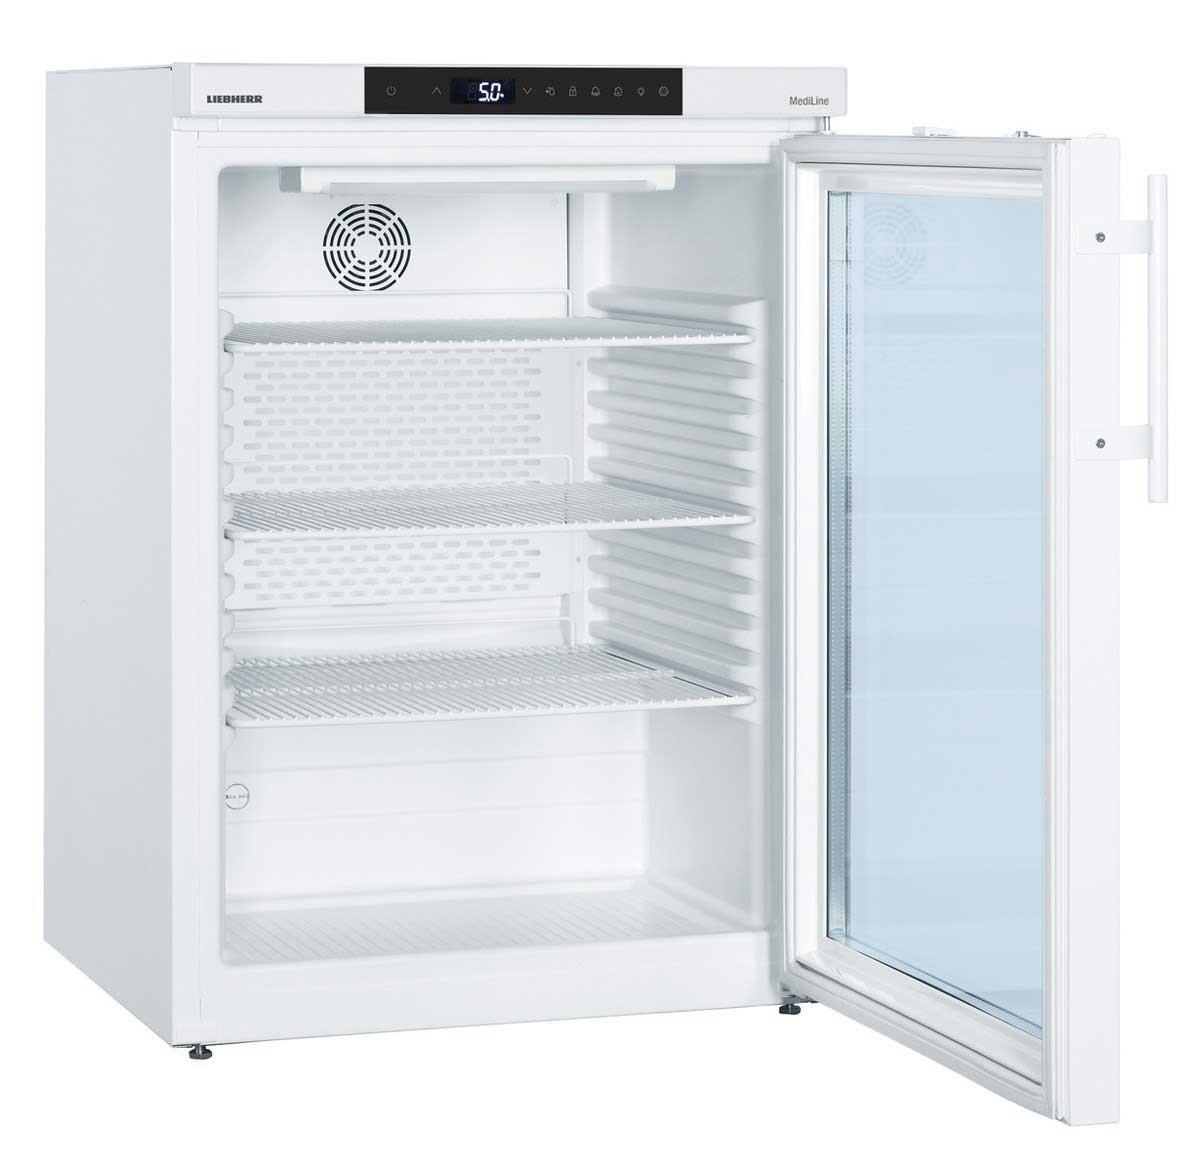 Refrigerateur Americain Faible Largeur liebherr mkuv 1613 (coolmed-g 8260)